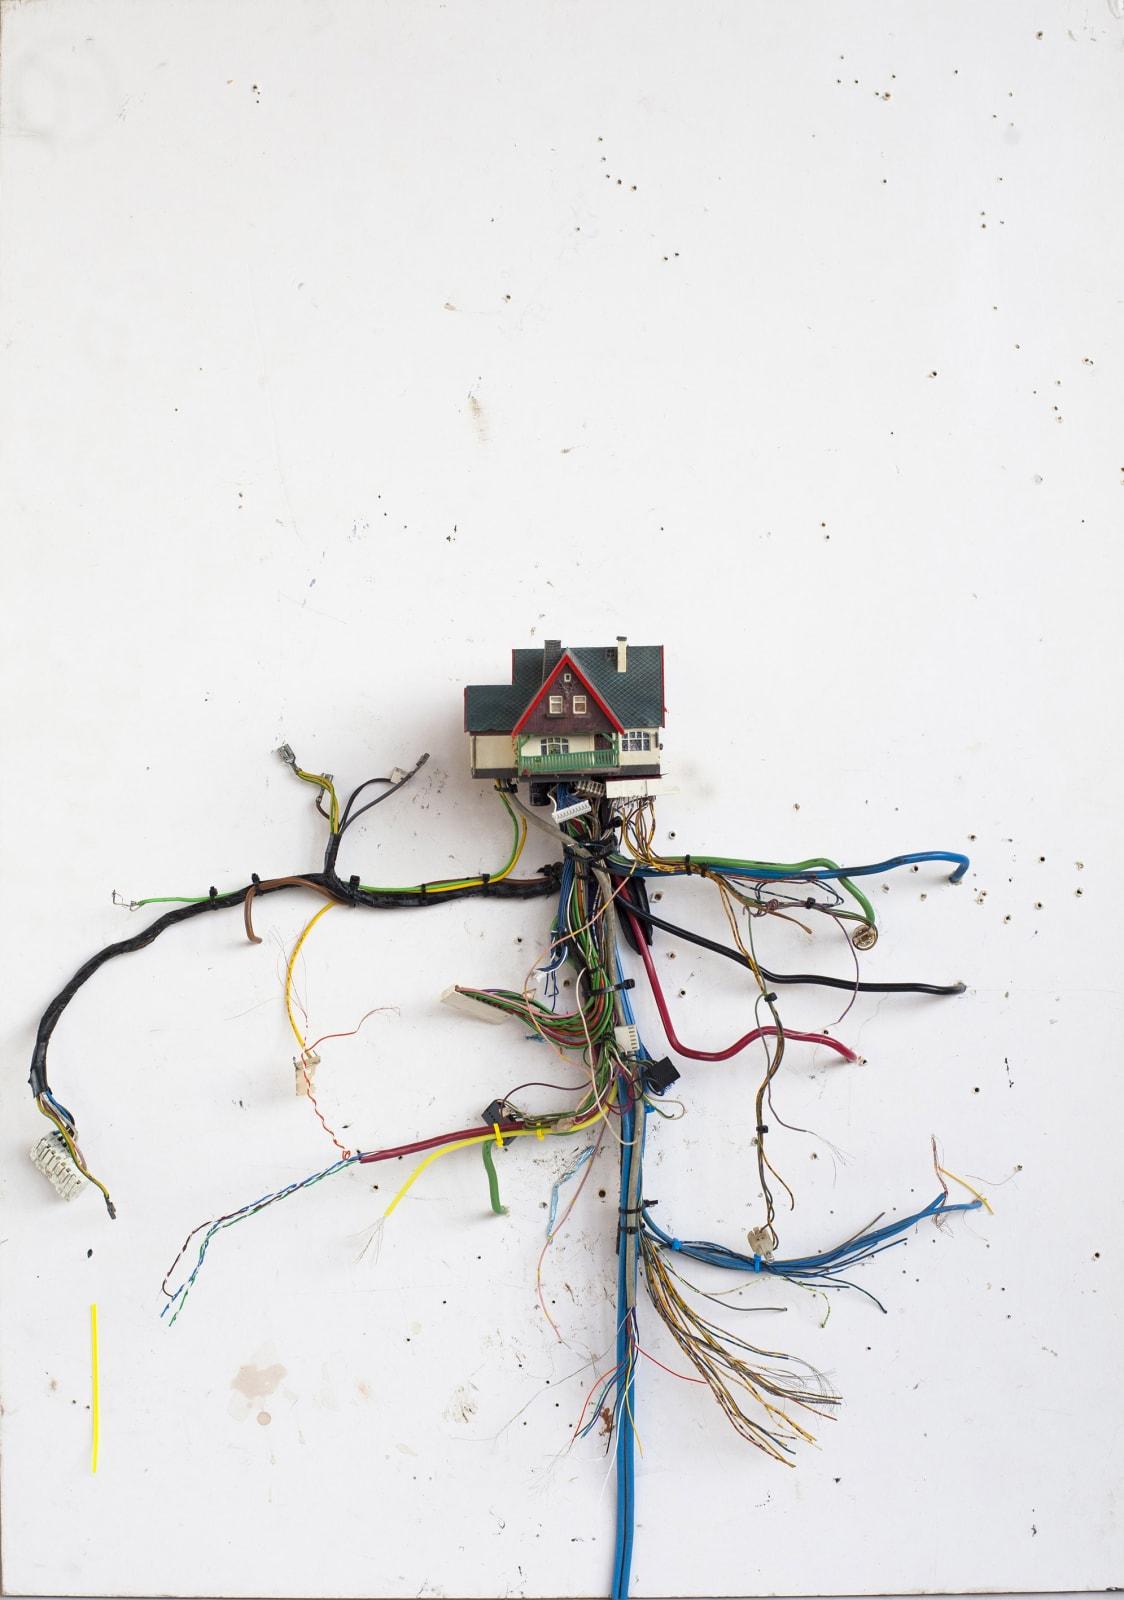 Kristof Kintera, How life works, 2018, mixed media cm 103 x 73